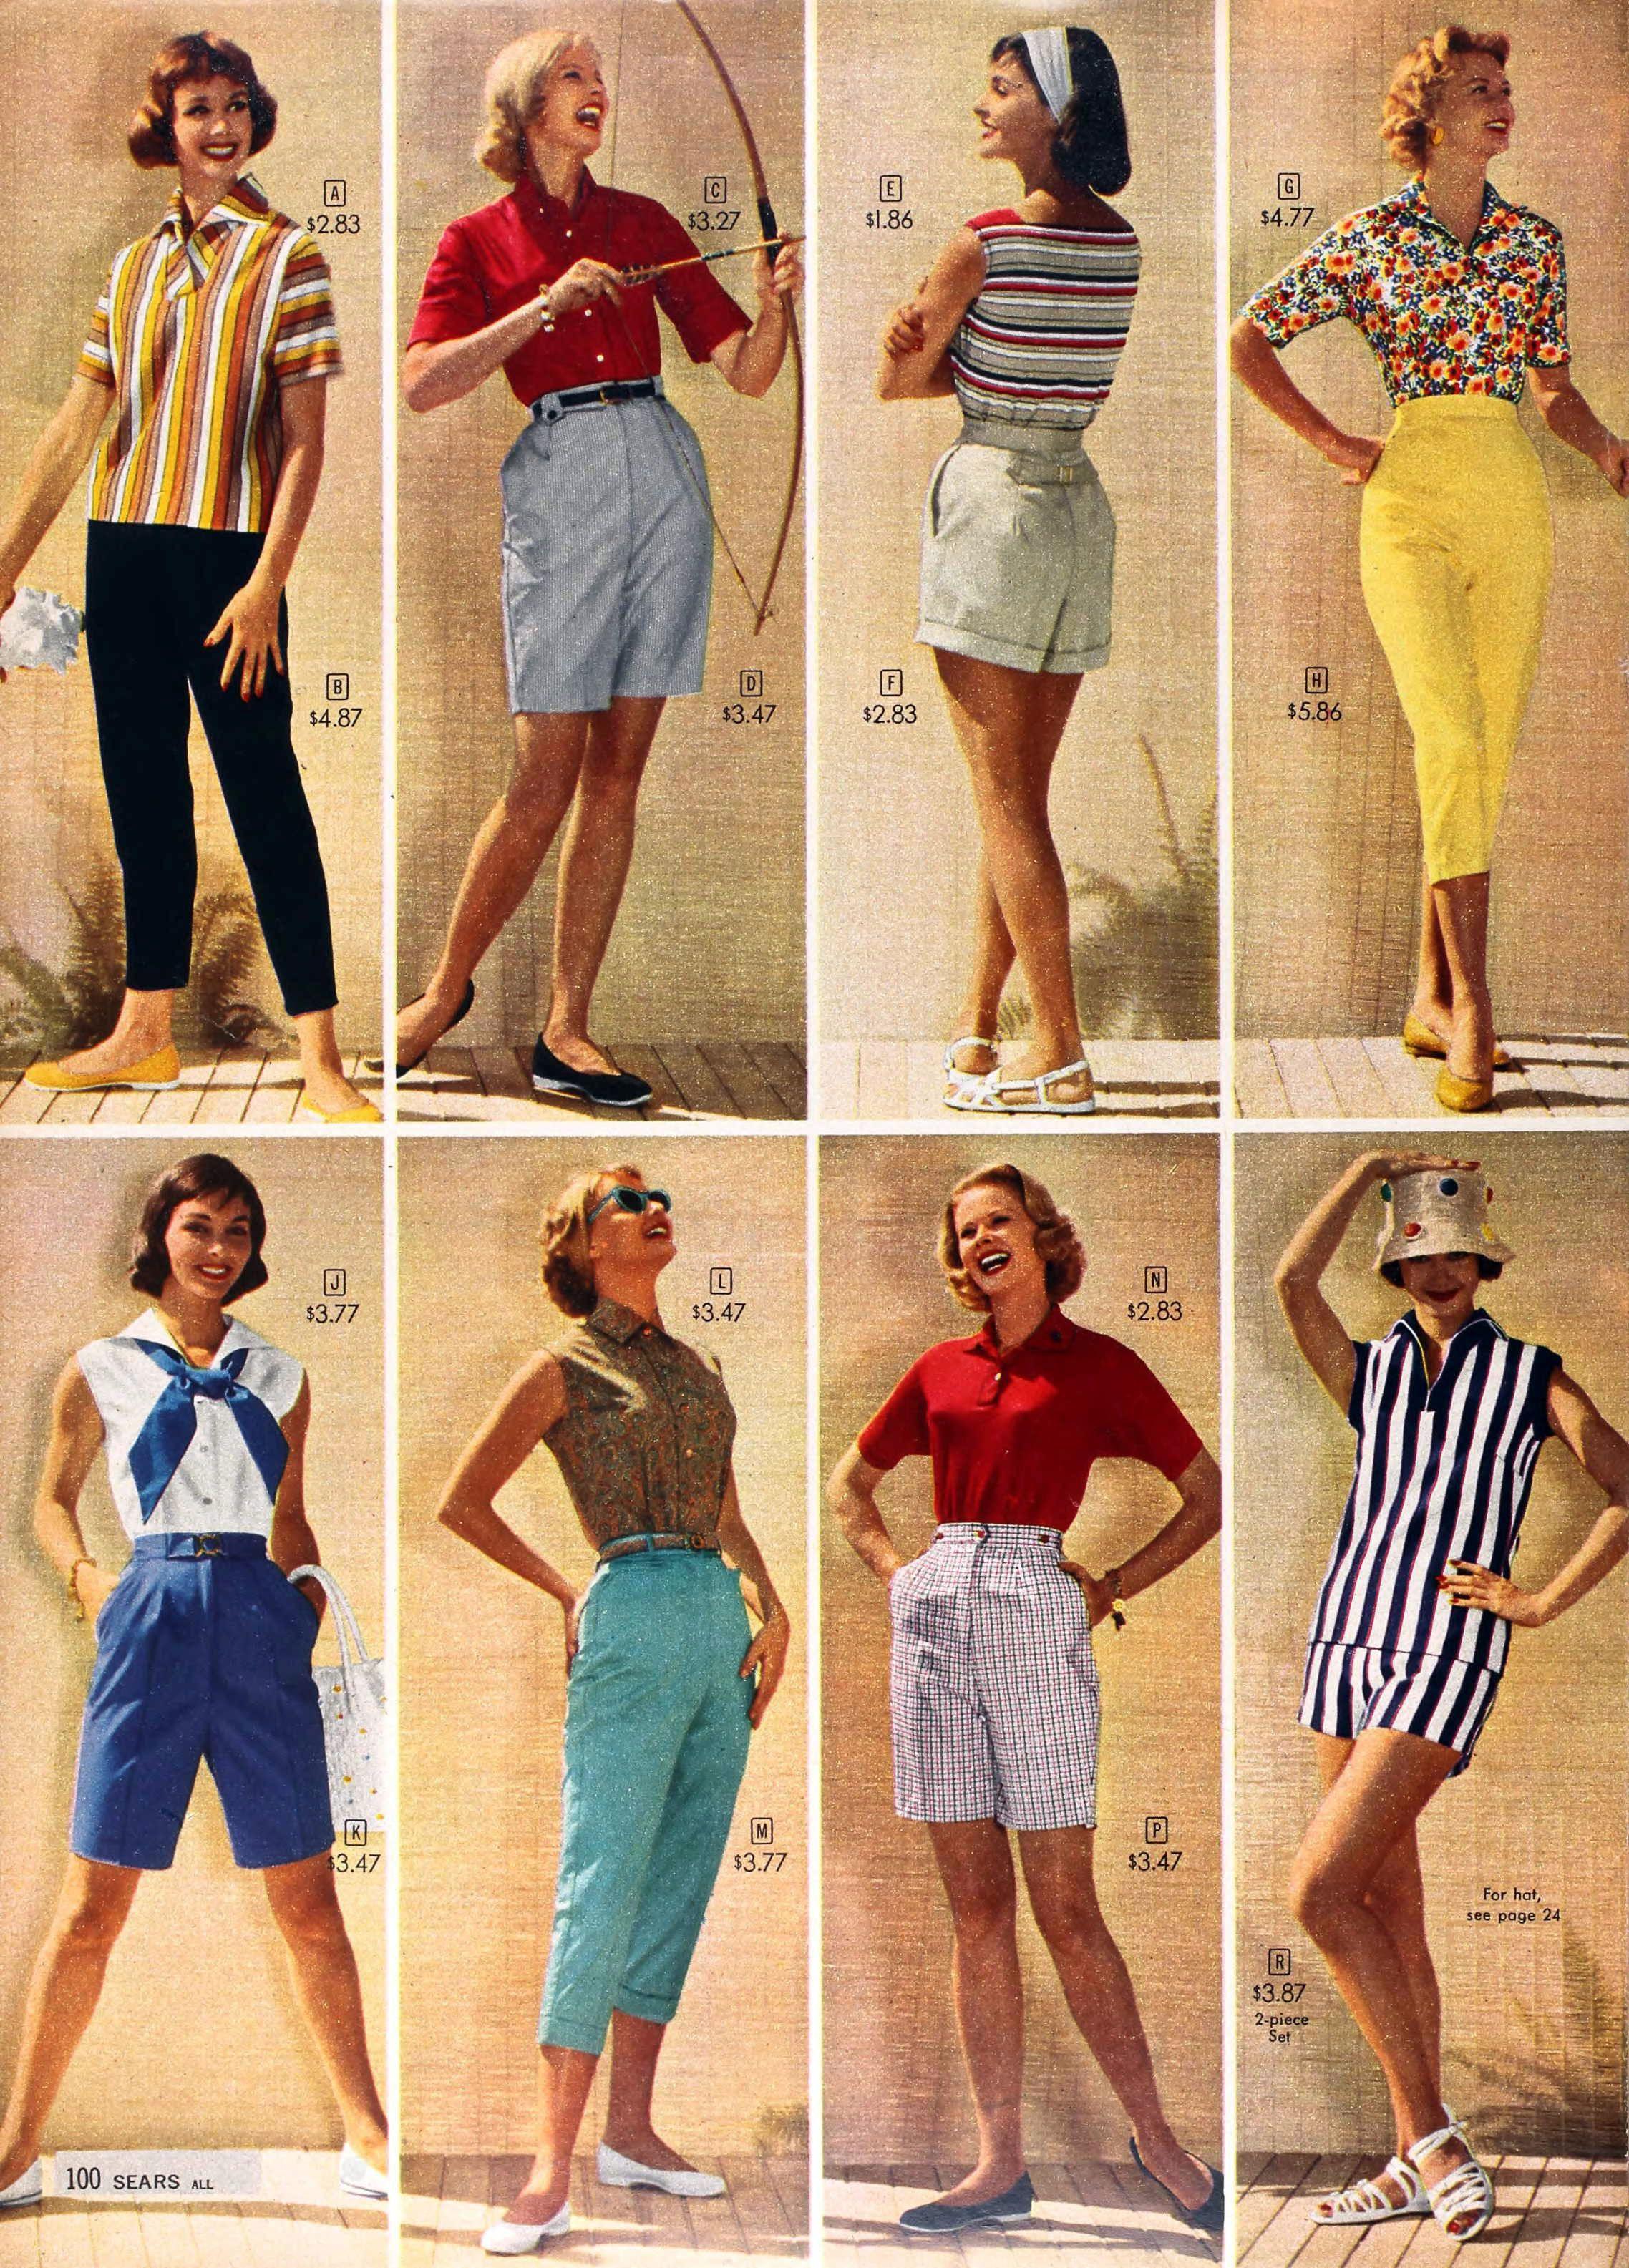 Pin By Olga Dmitrieva On History Of Fashion 50s Outfits 1950s Fashion Retro Fashion